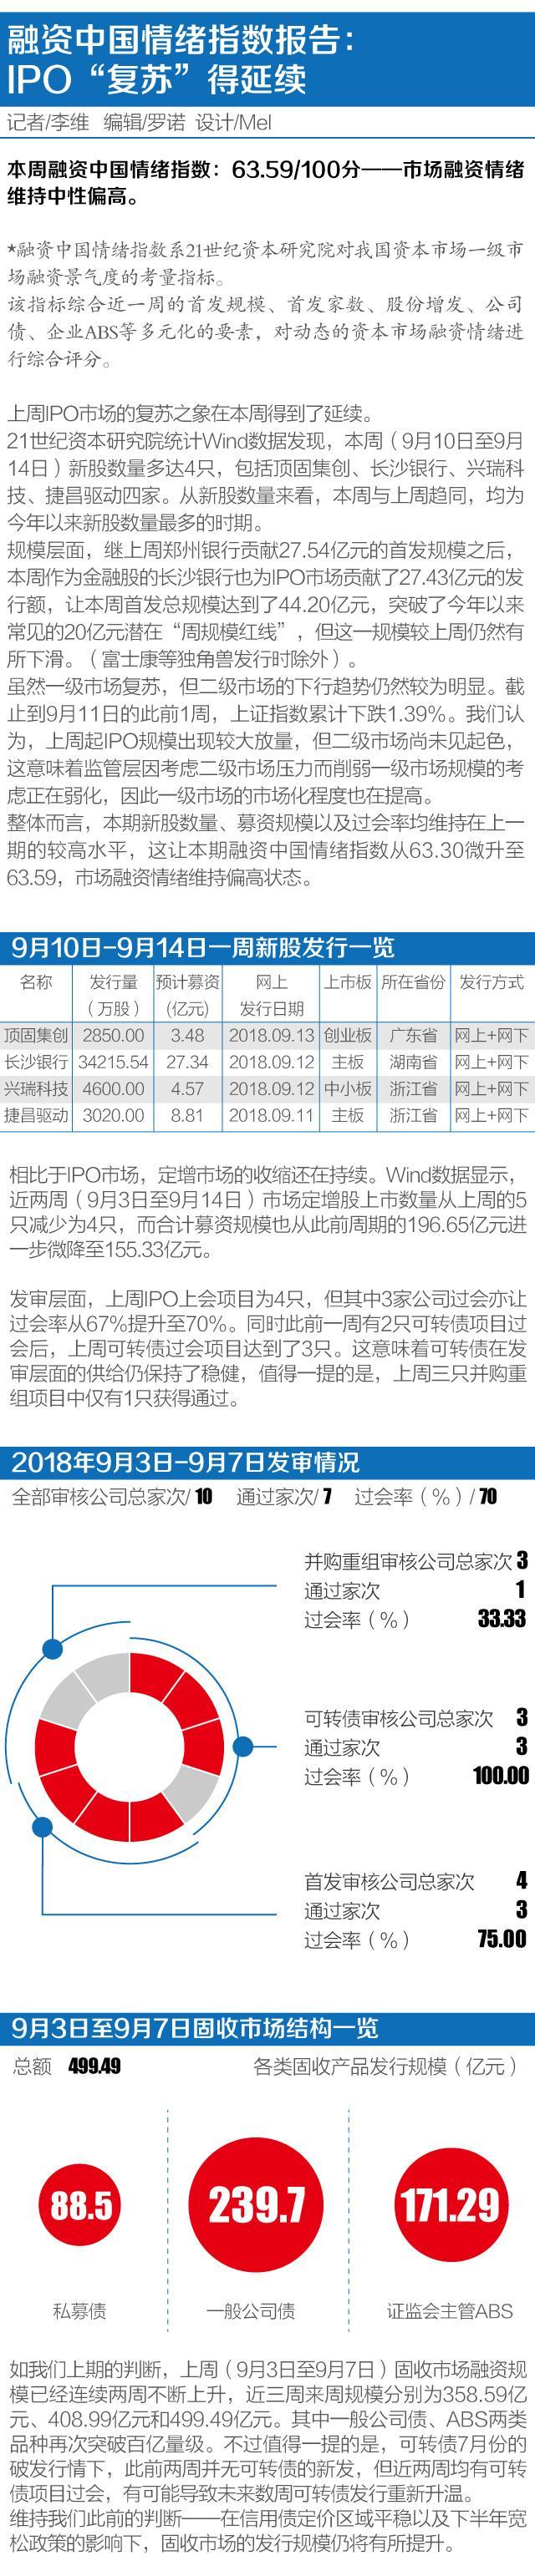 A股和H股IPO市场此消彼长 大量新三板企业迁徙香港